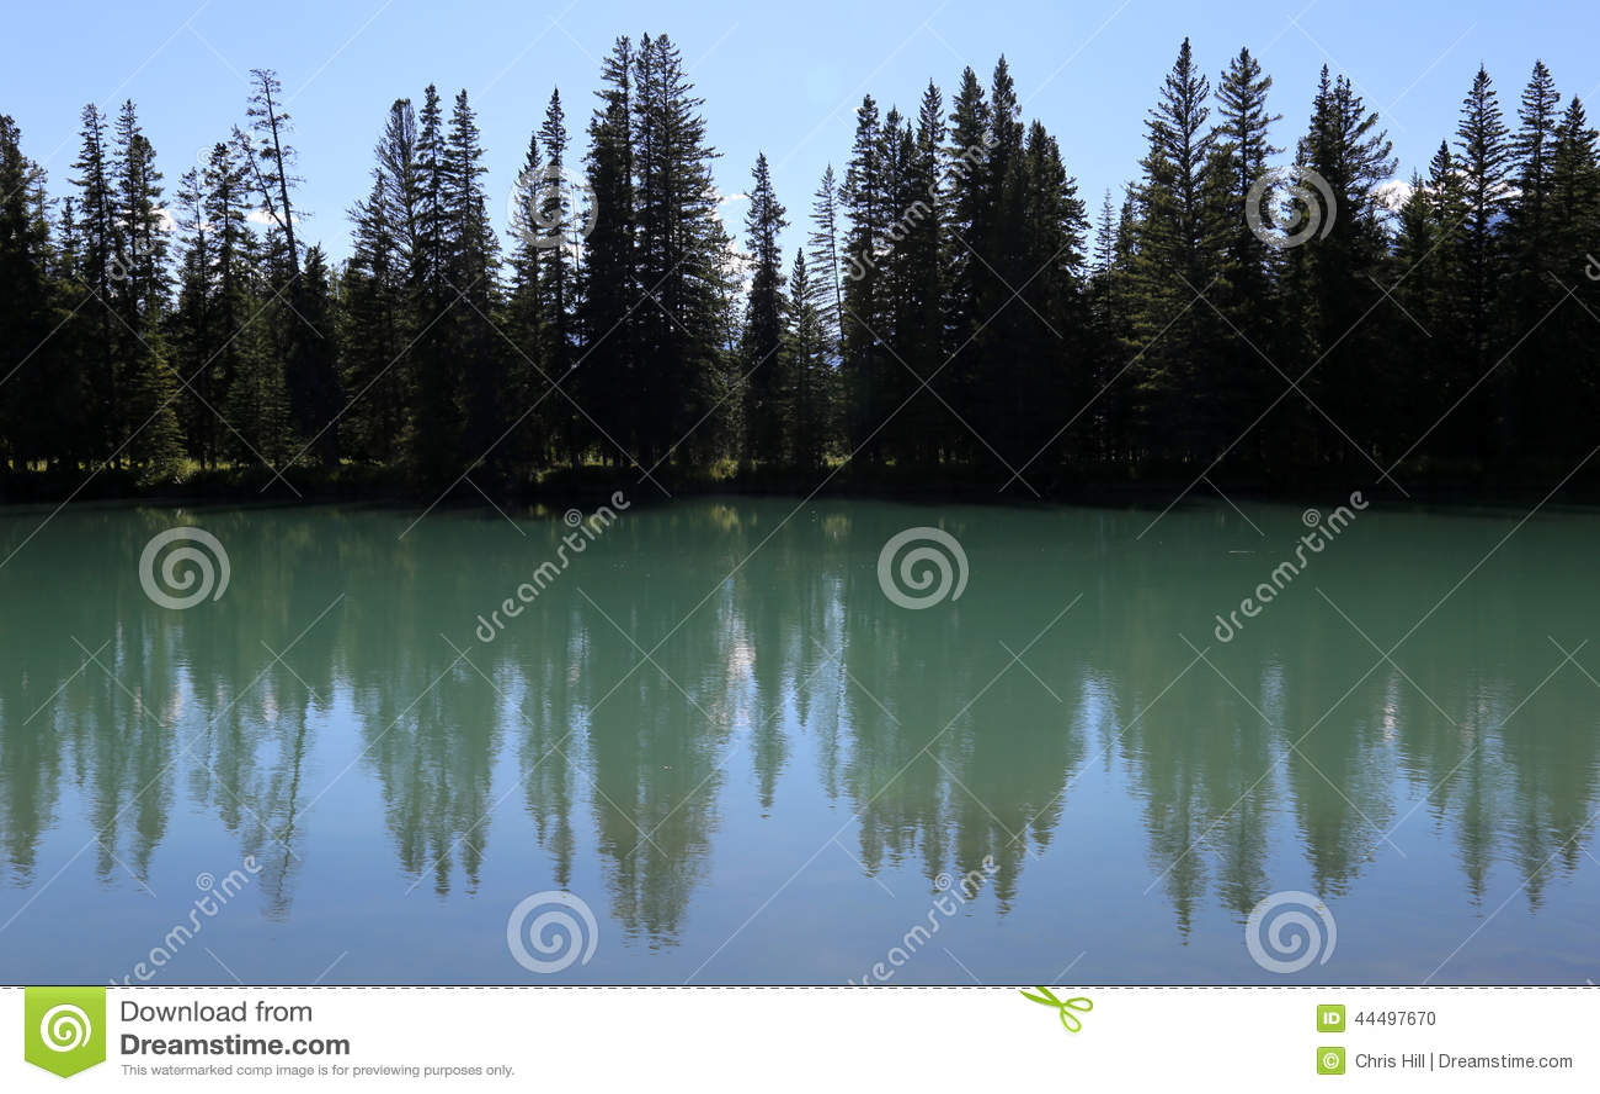 bow river tree line stock photo image 44497670